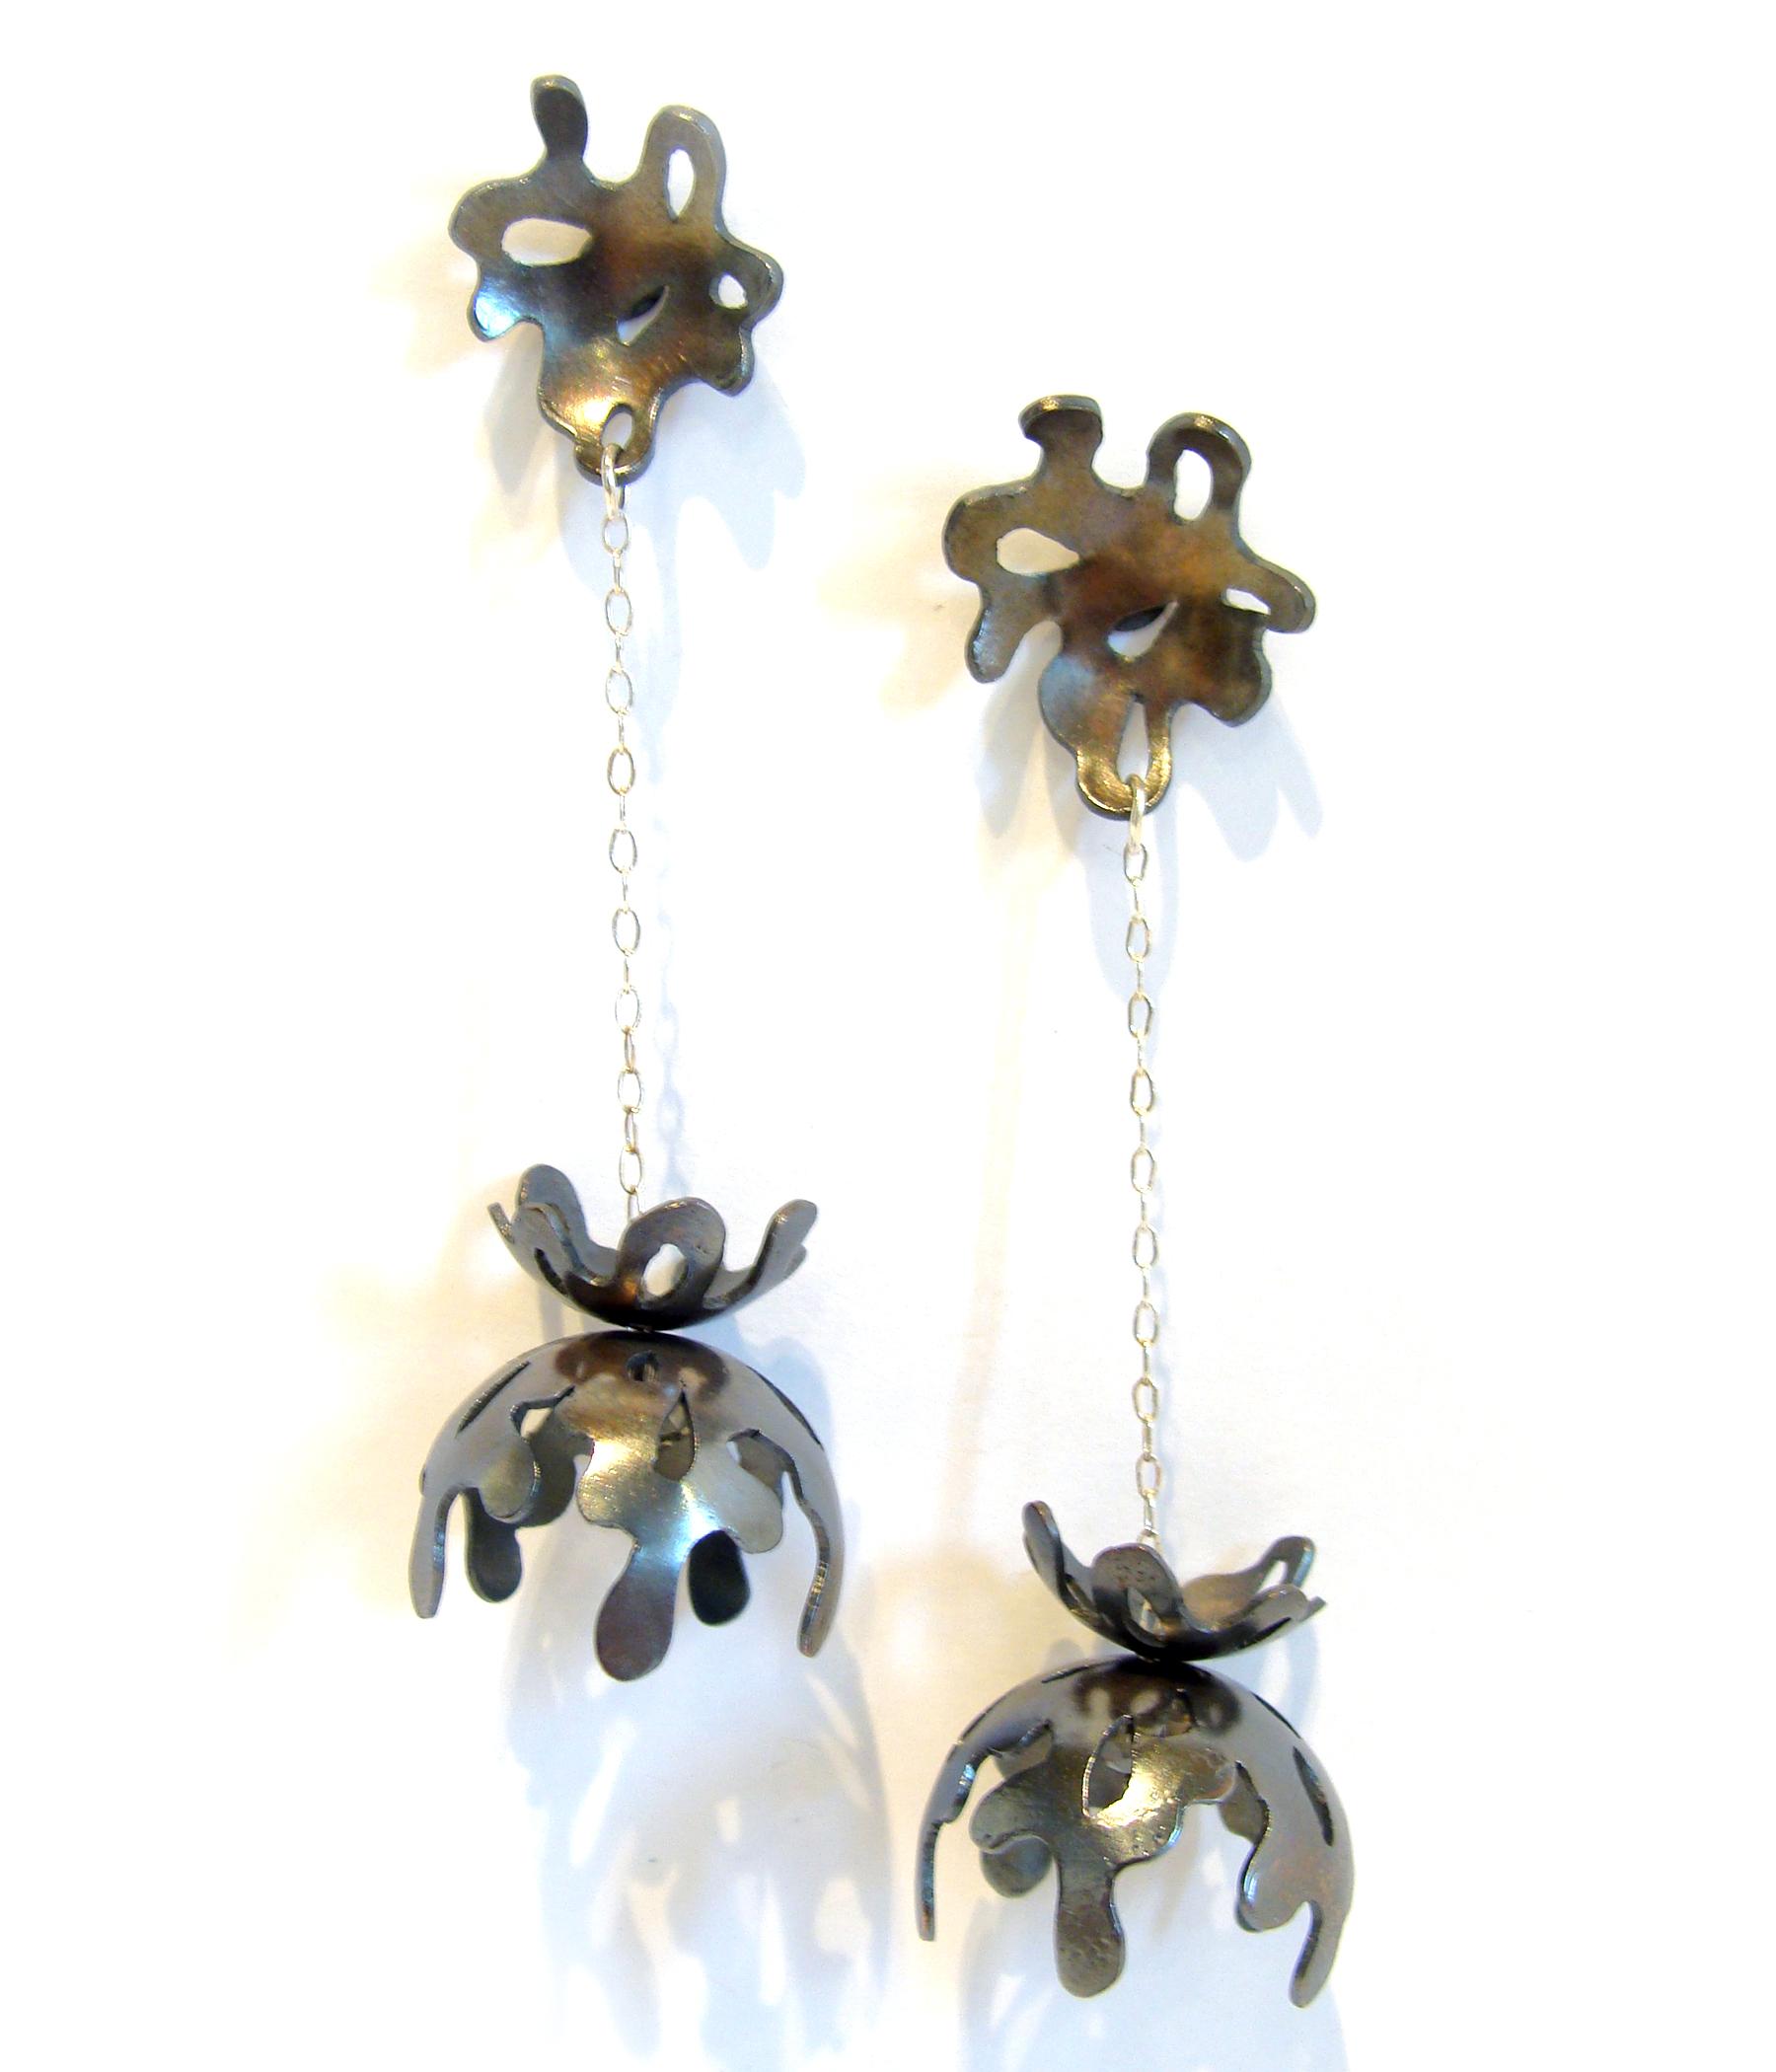 Earrings_Double Dangle_Dome_2a.jpg